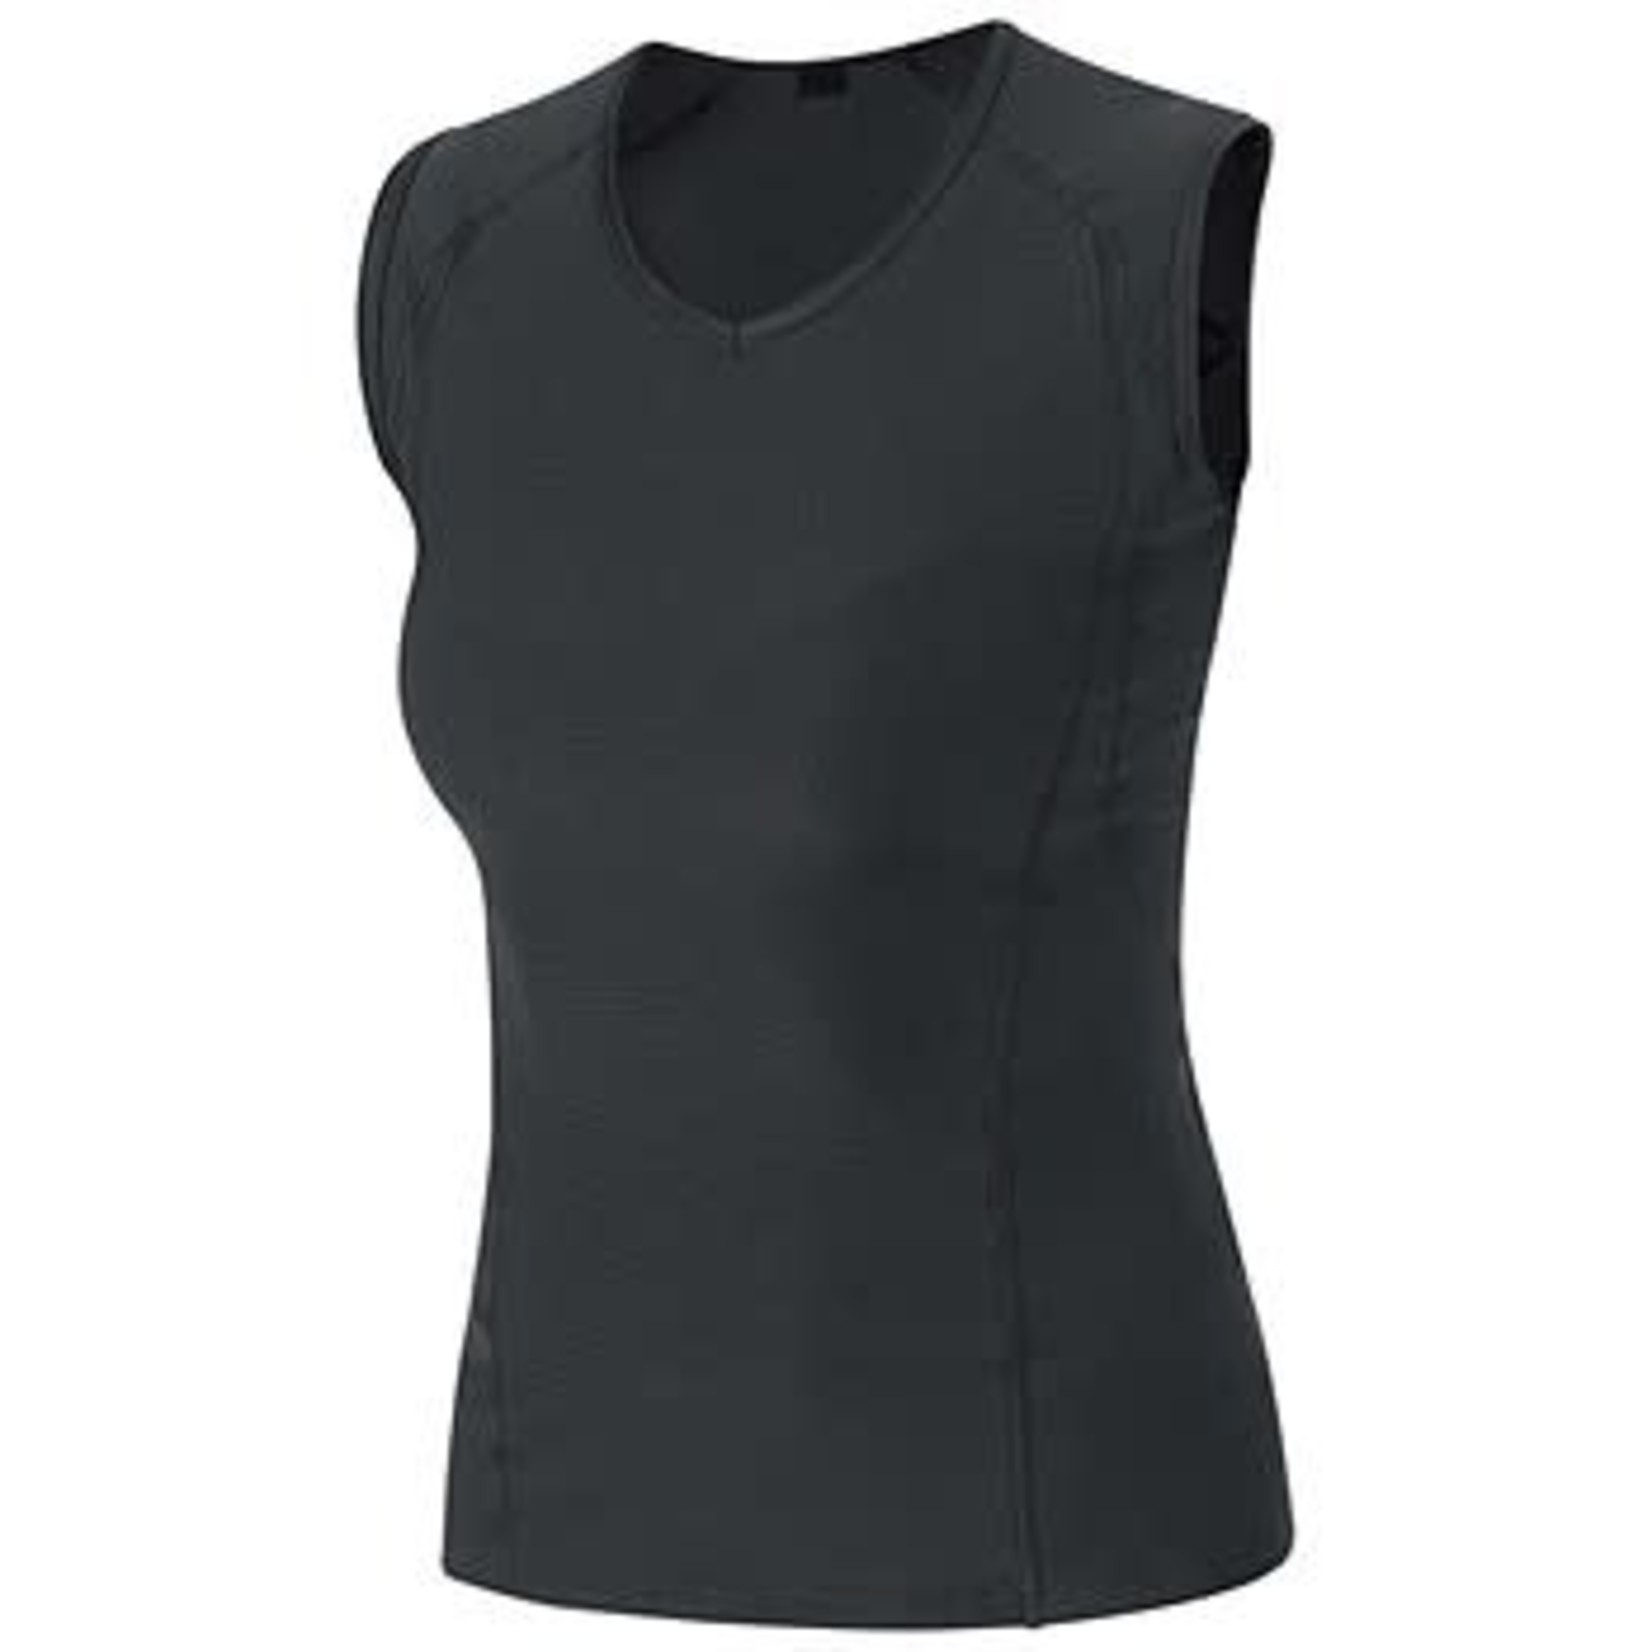 GORE Wear GORE M Wmn GWS BL Sleeveless Shirt black 40